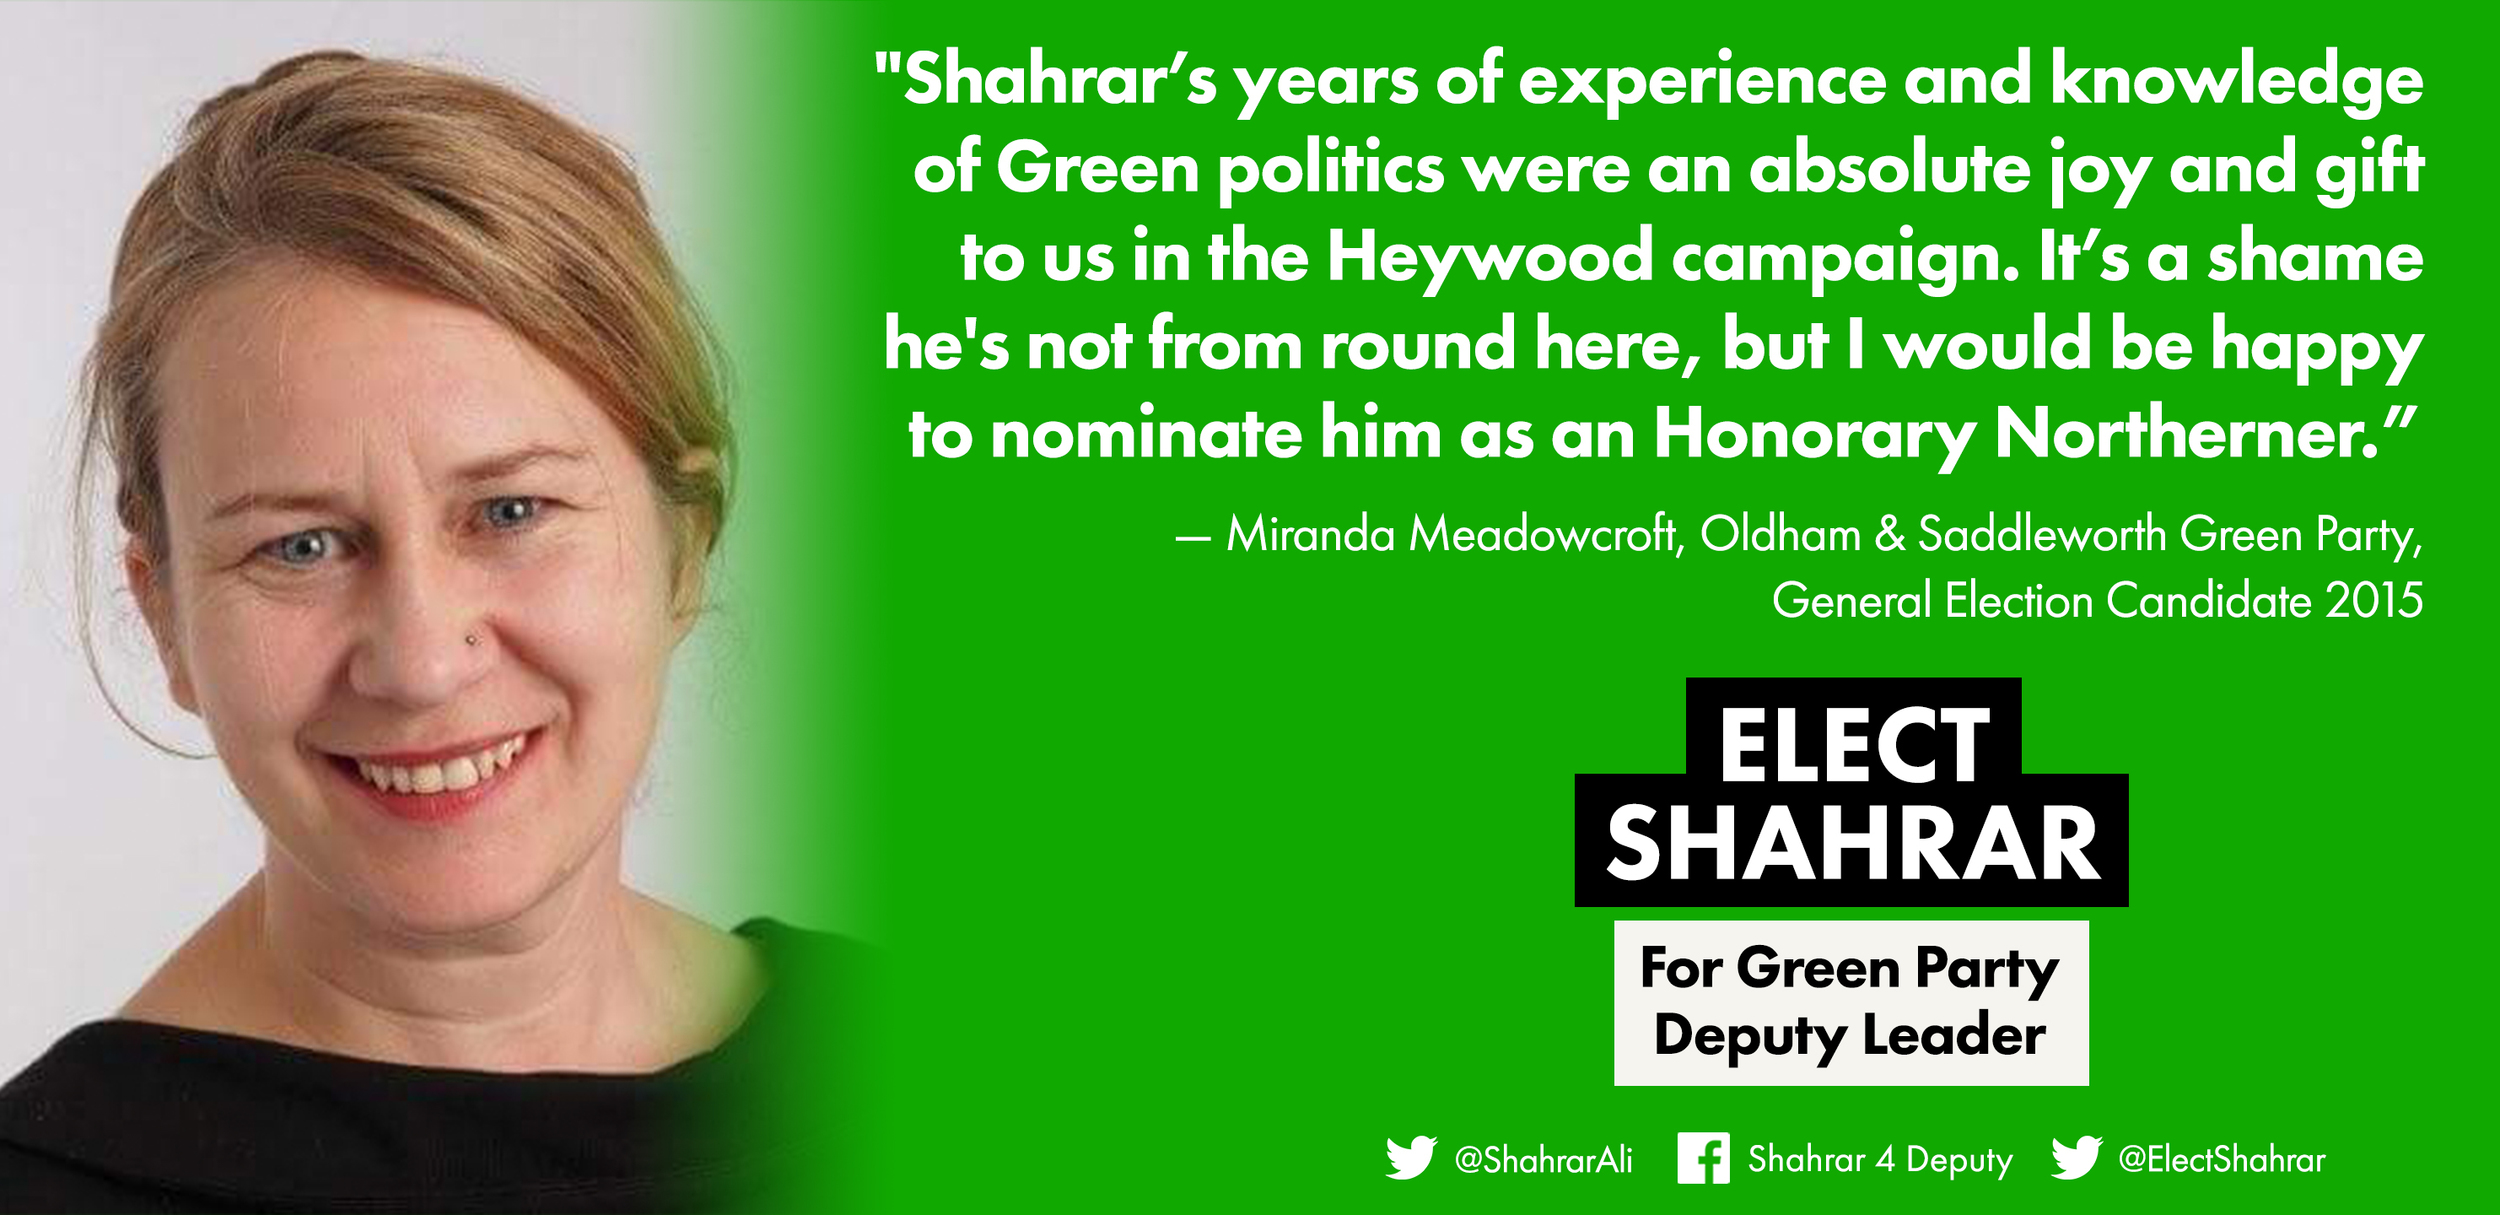 ElectShahrar Miranda Meadowcroft Endorsement.jpg